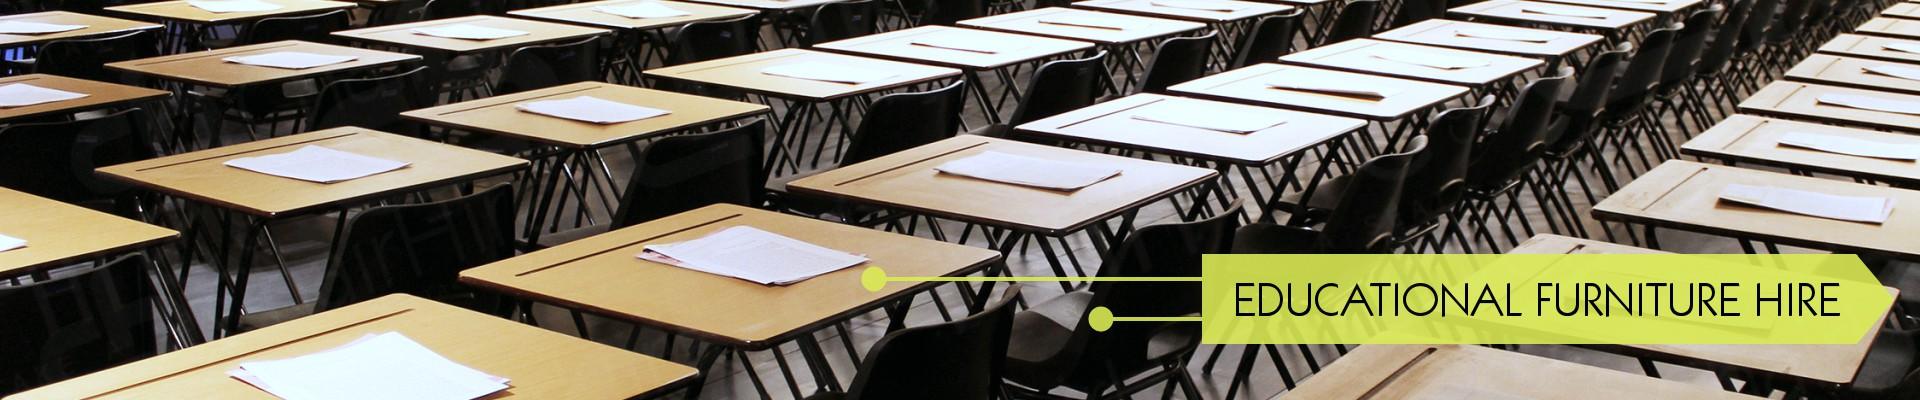 educational-furniture-hire